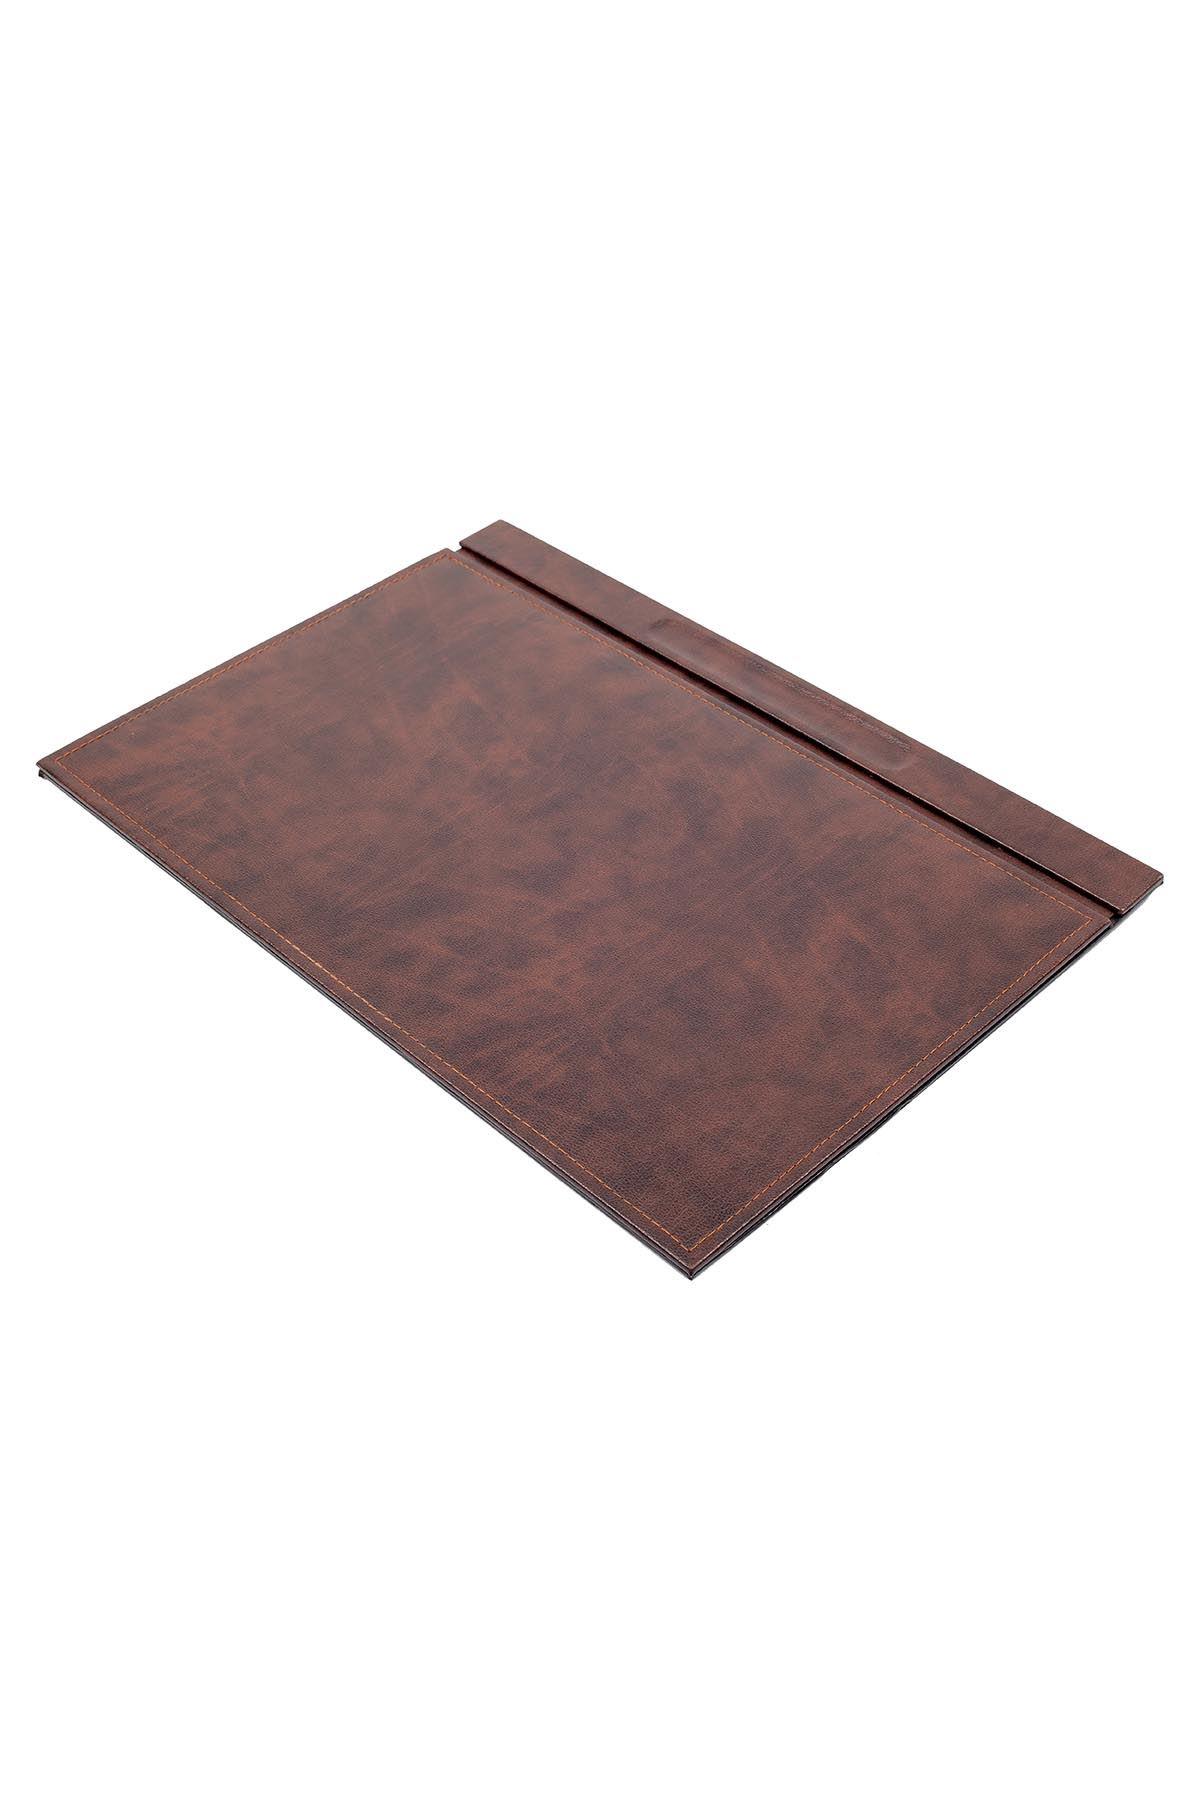 Leather Desk Set 8 Accessories Brown